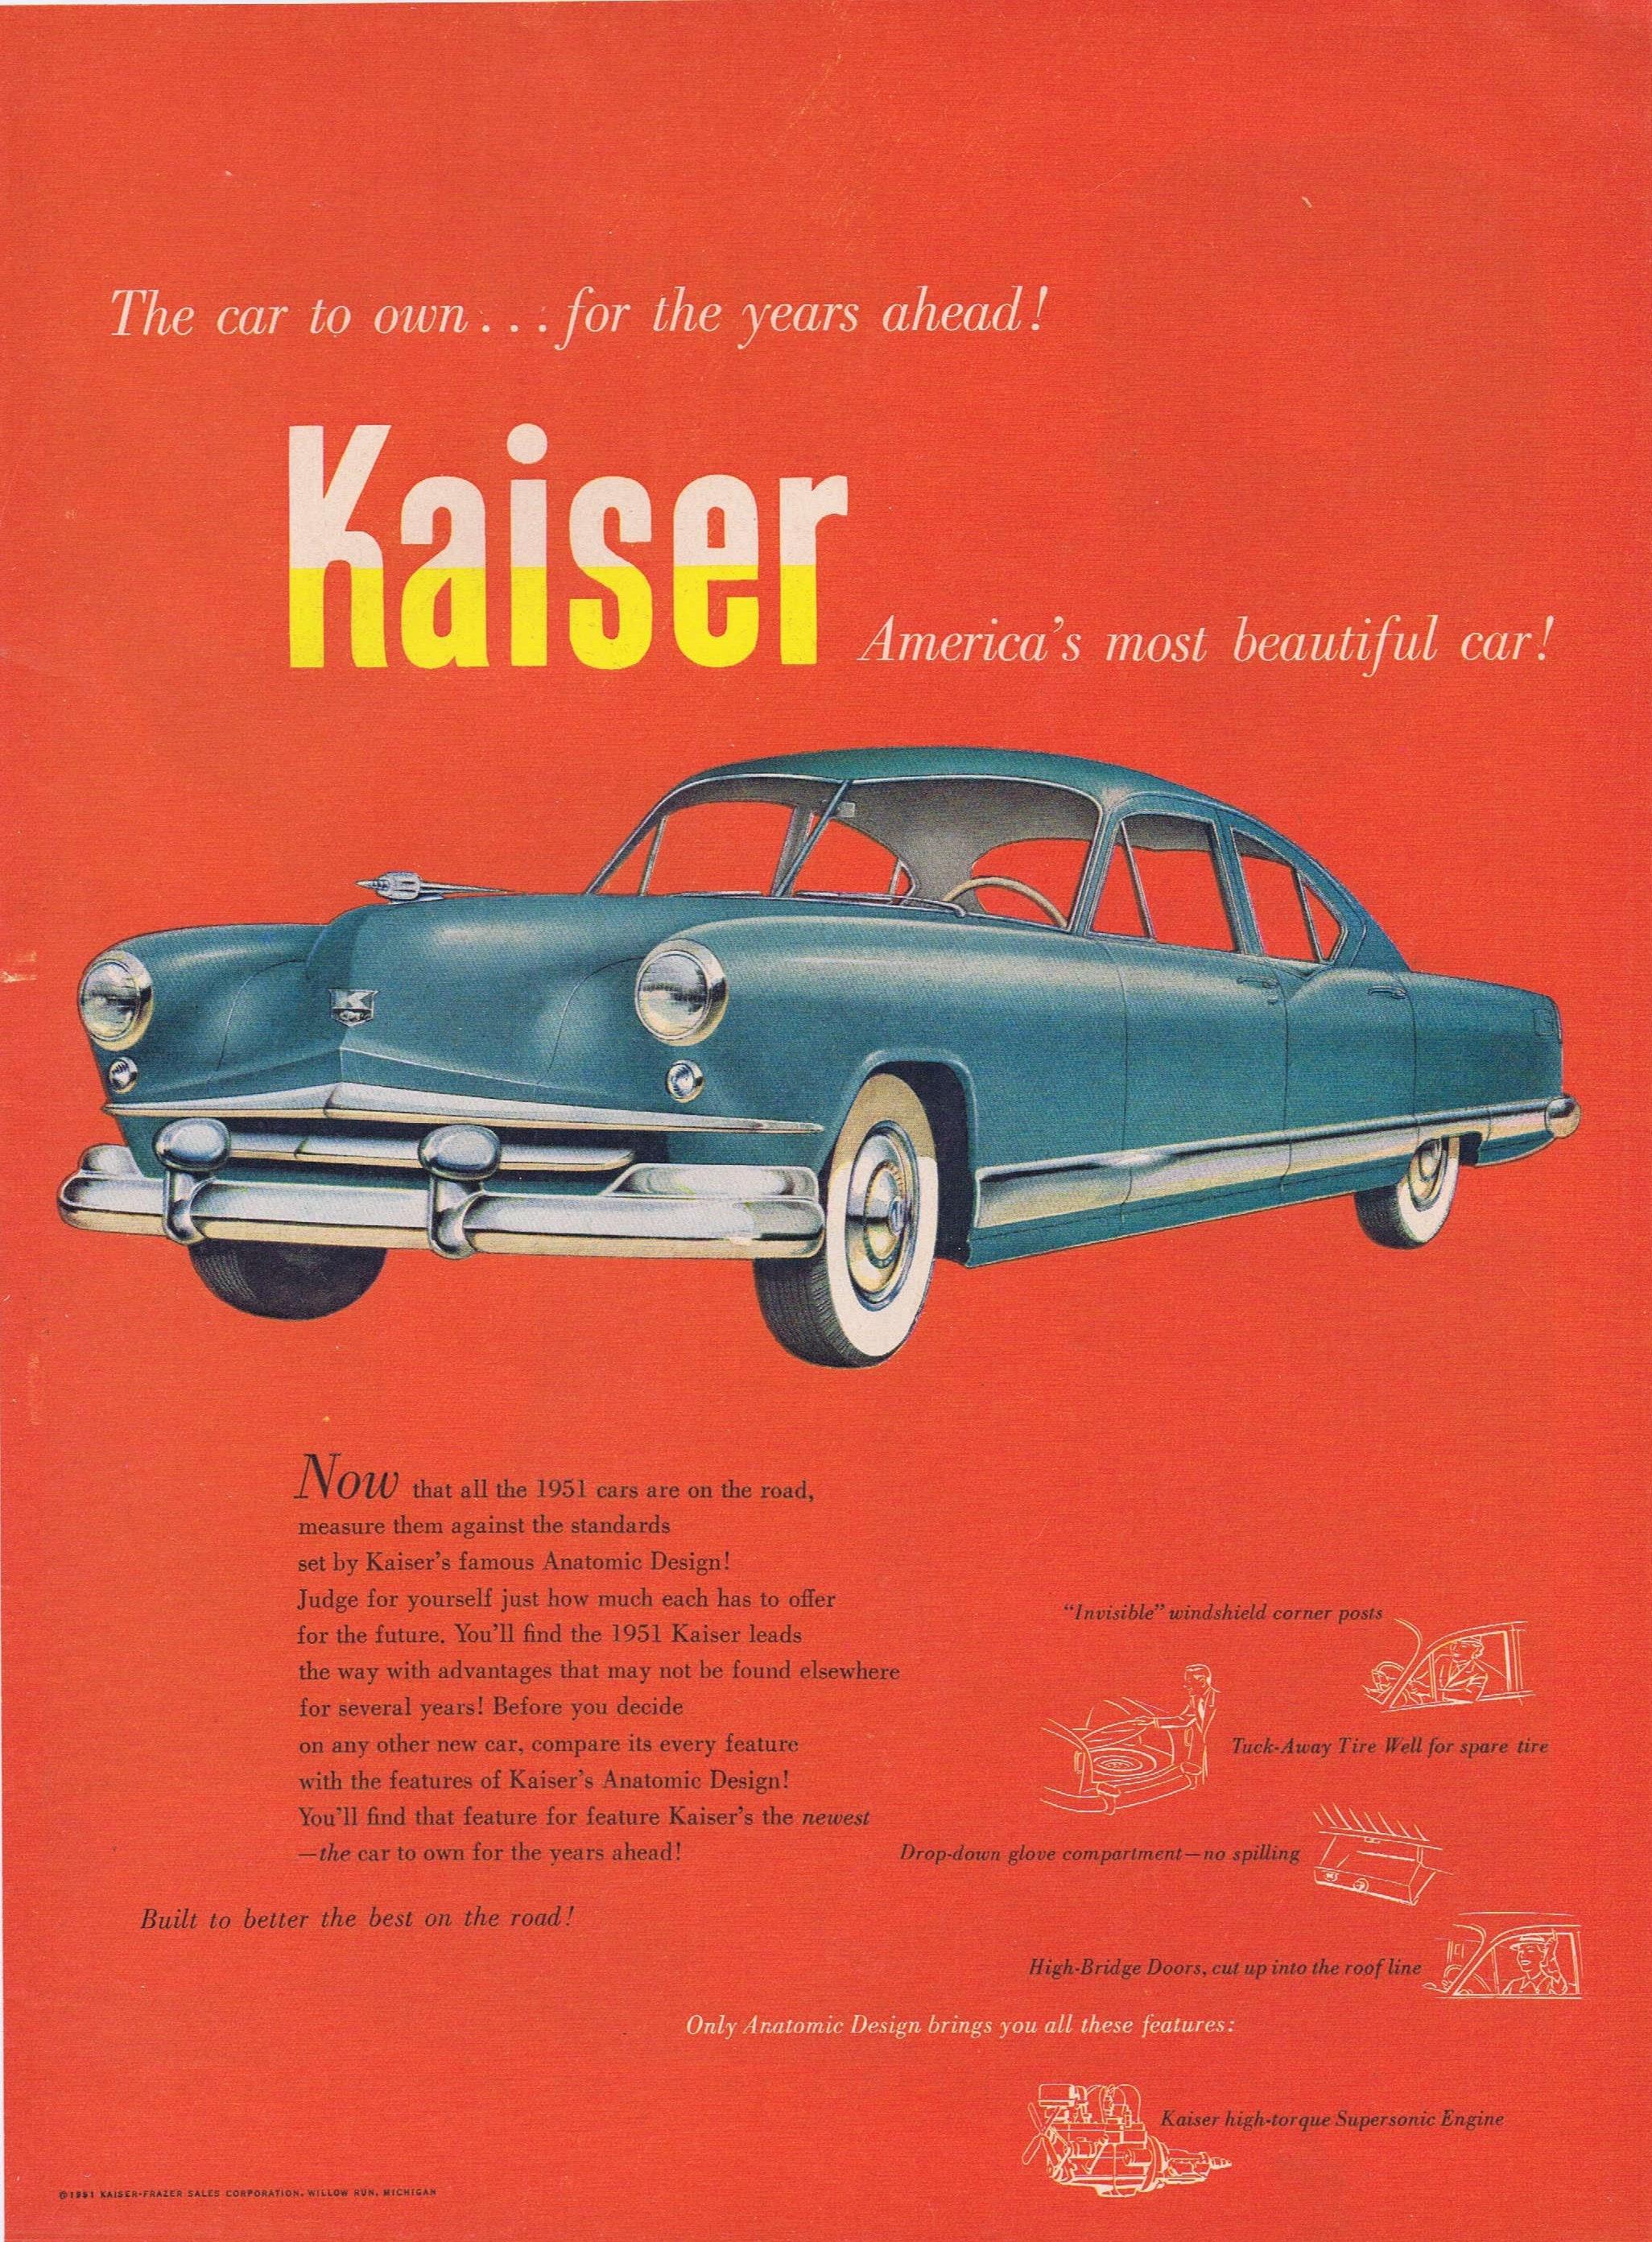 1951 Kaiser American S Most Beautiful Car Original Vintage